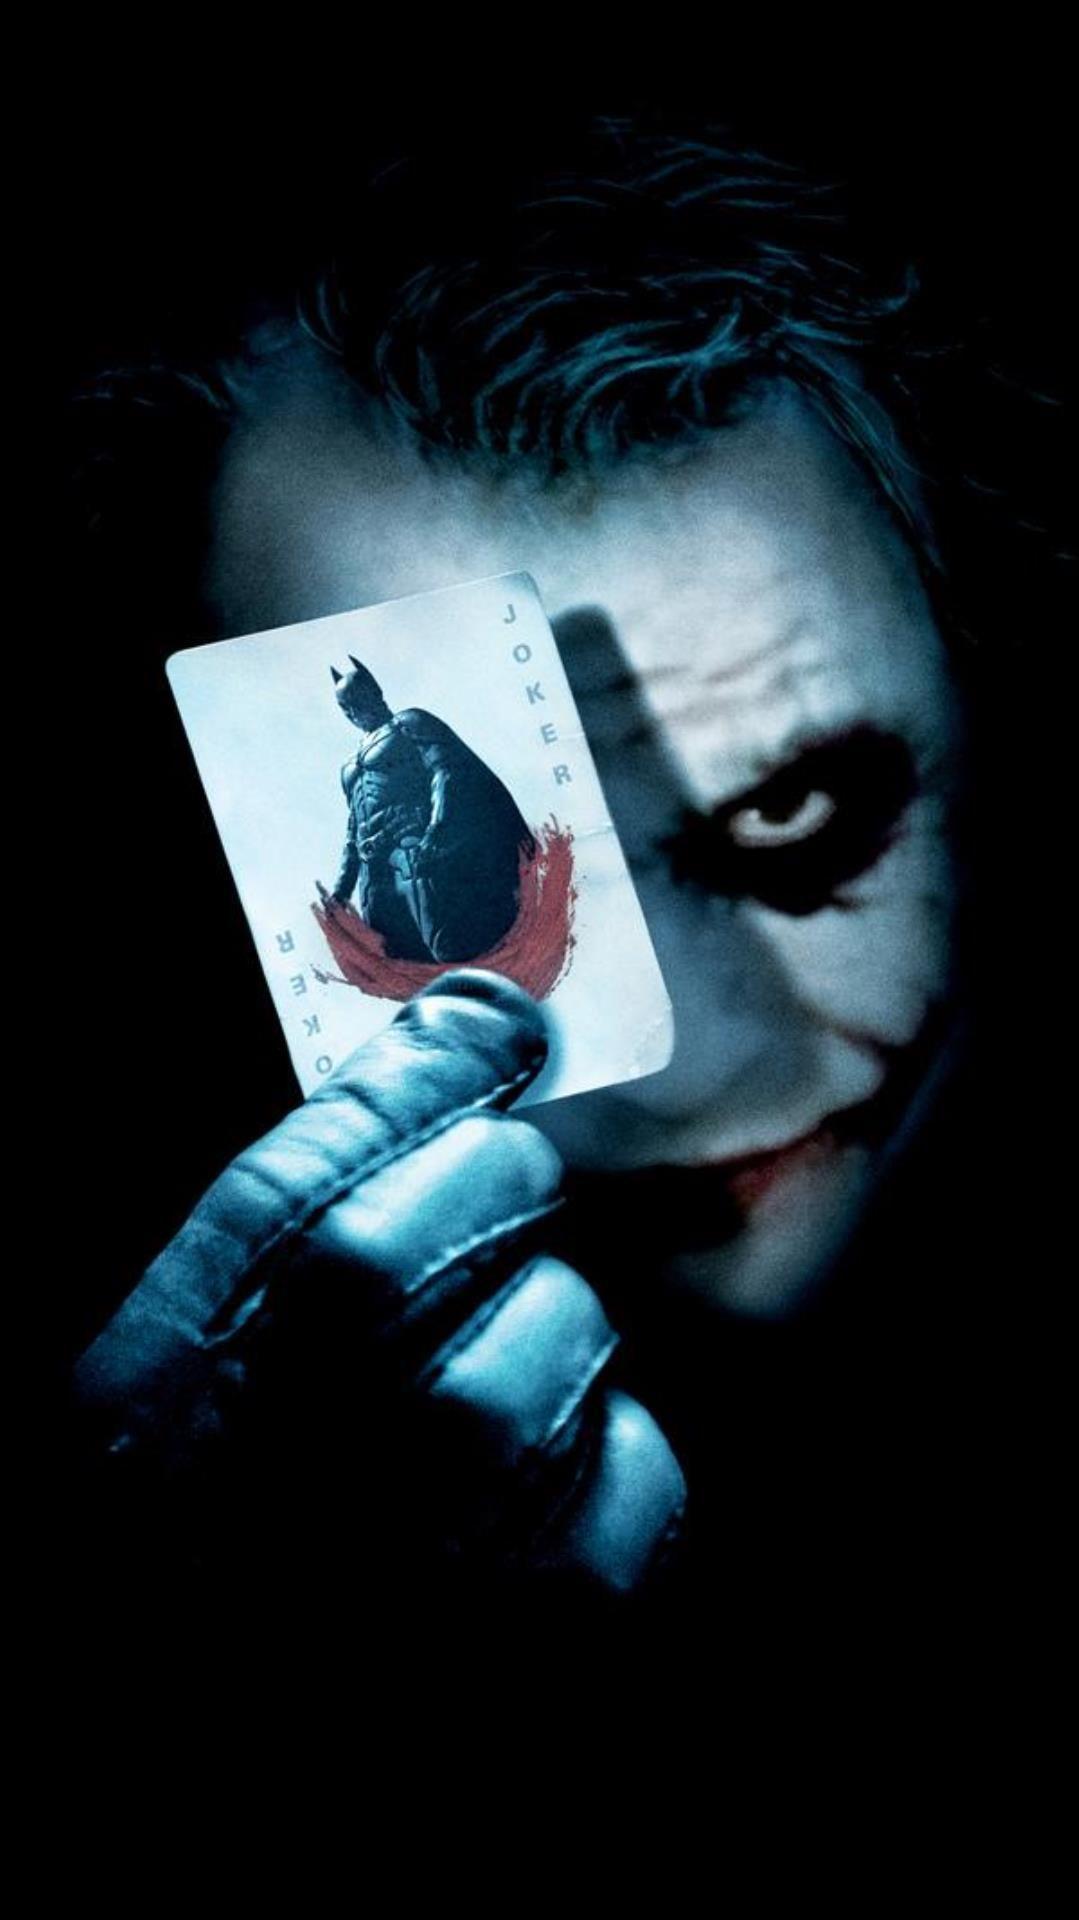 Joker Wallpapers Batman Joker Wallpaper Joker Iphone Wallpaper Joker Images Joker hd wallpapers for iphone 7 plus